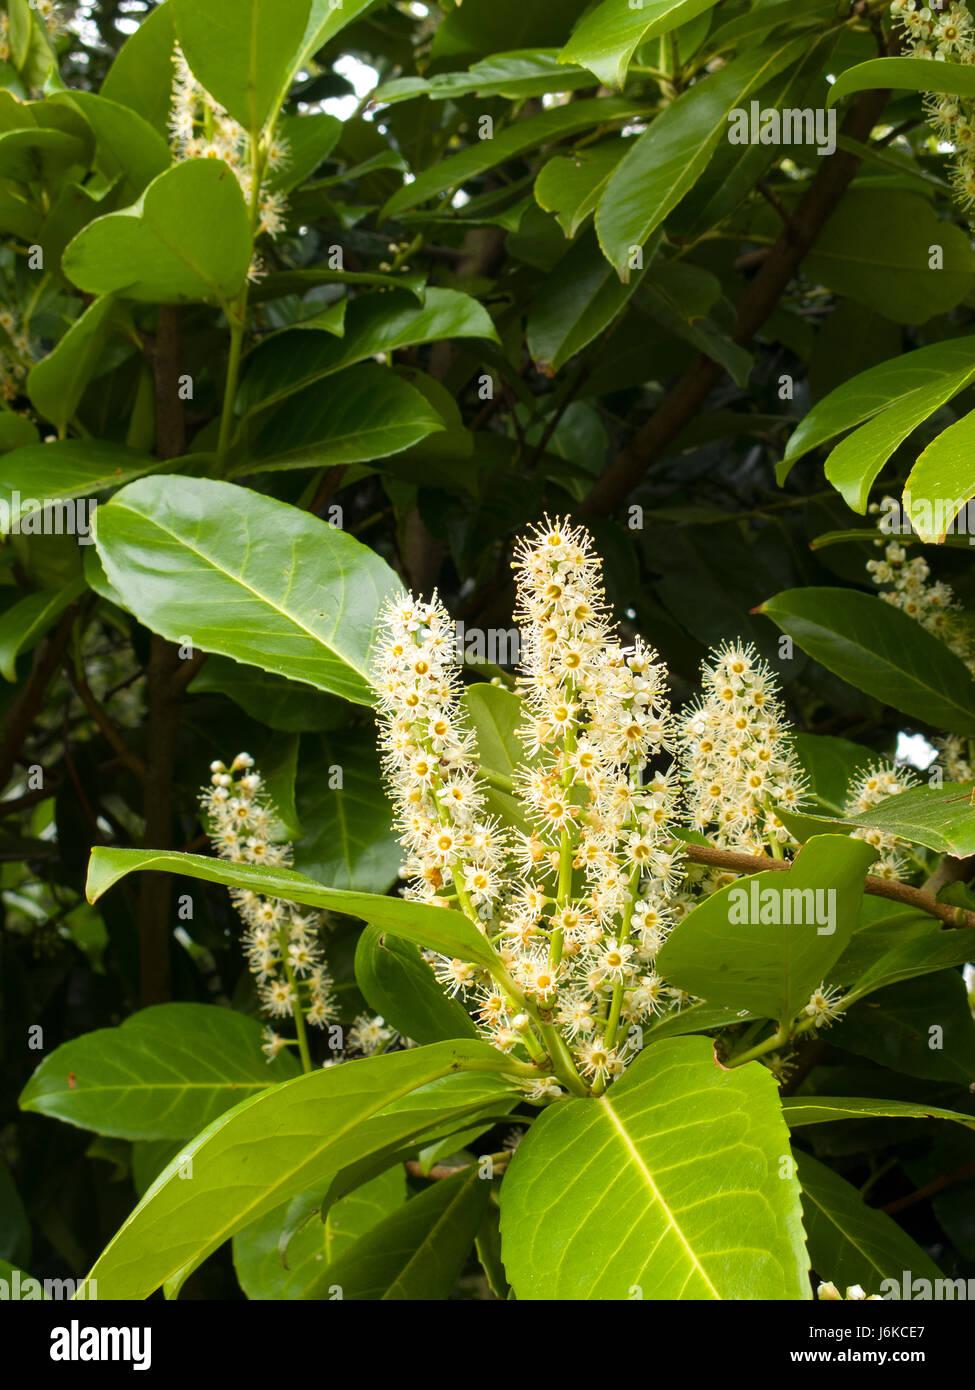 English Laurel in flower - Stock Image